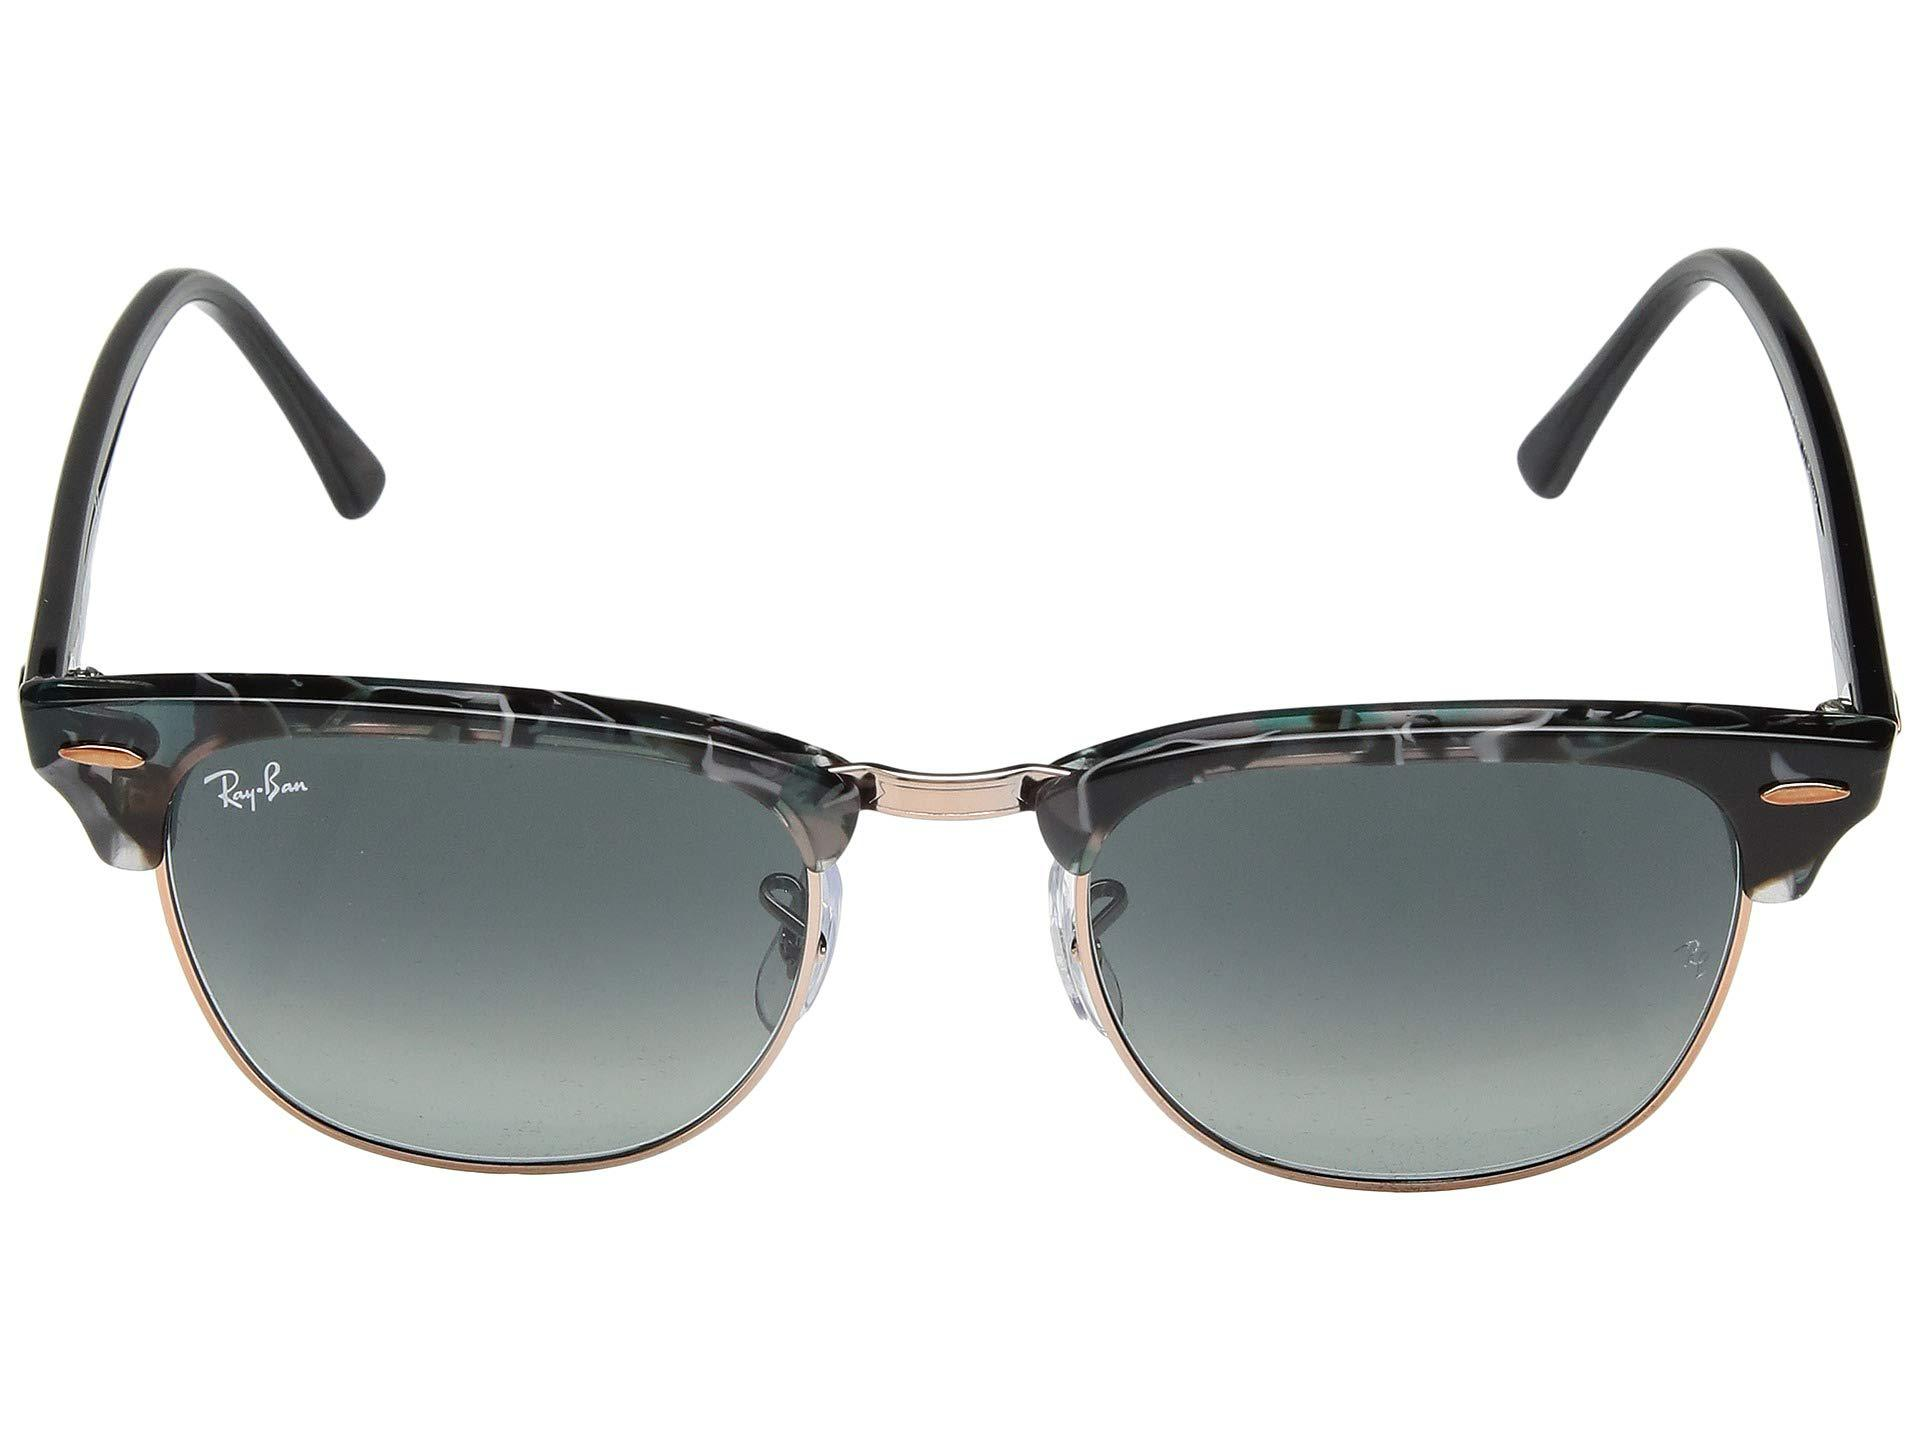 14985a5553d8 Ray-Ban - Gray Clubmaster Rb3016 51mm (dark Tortoise) Fashion Sunglasses  for Men. View fullscreen